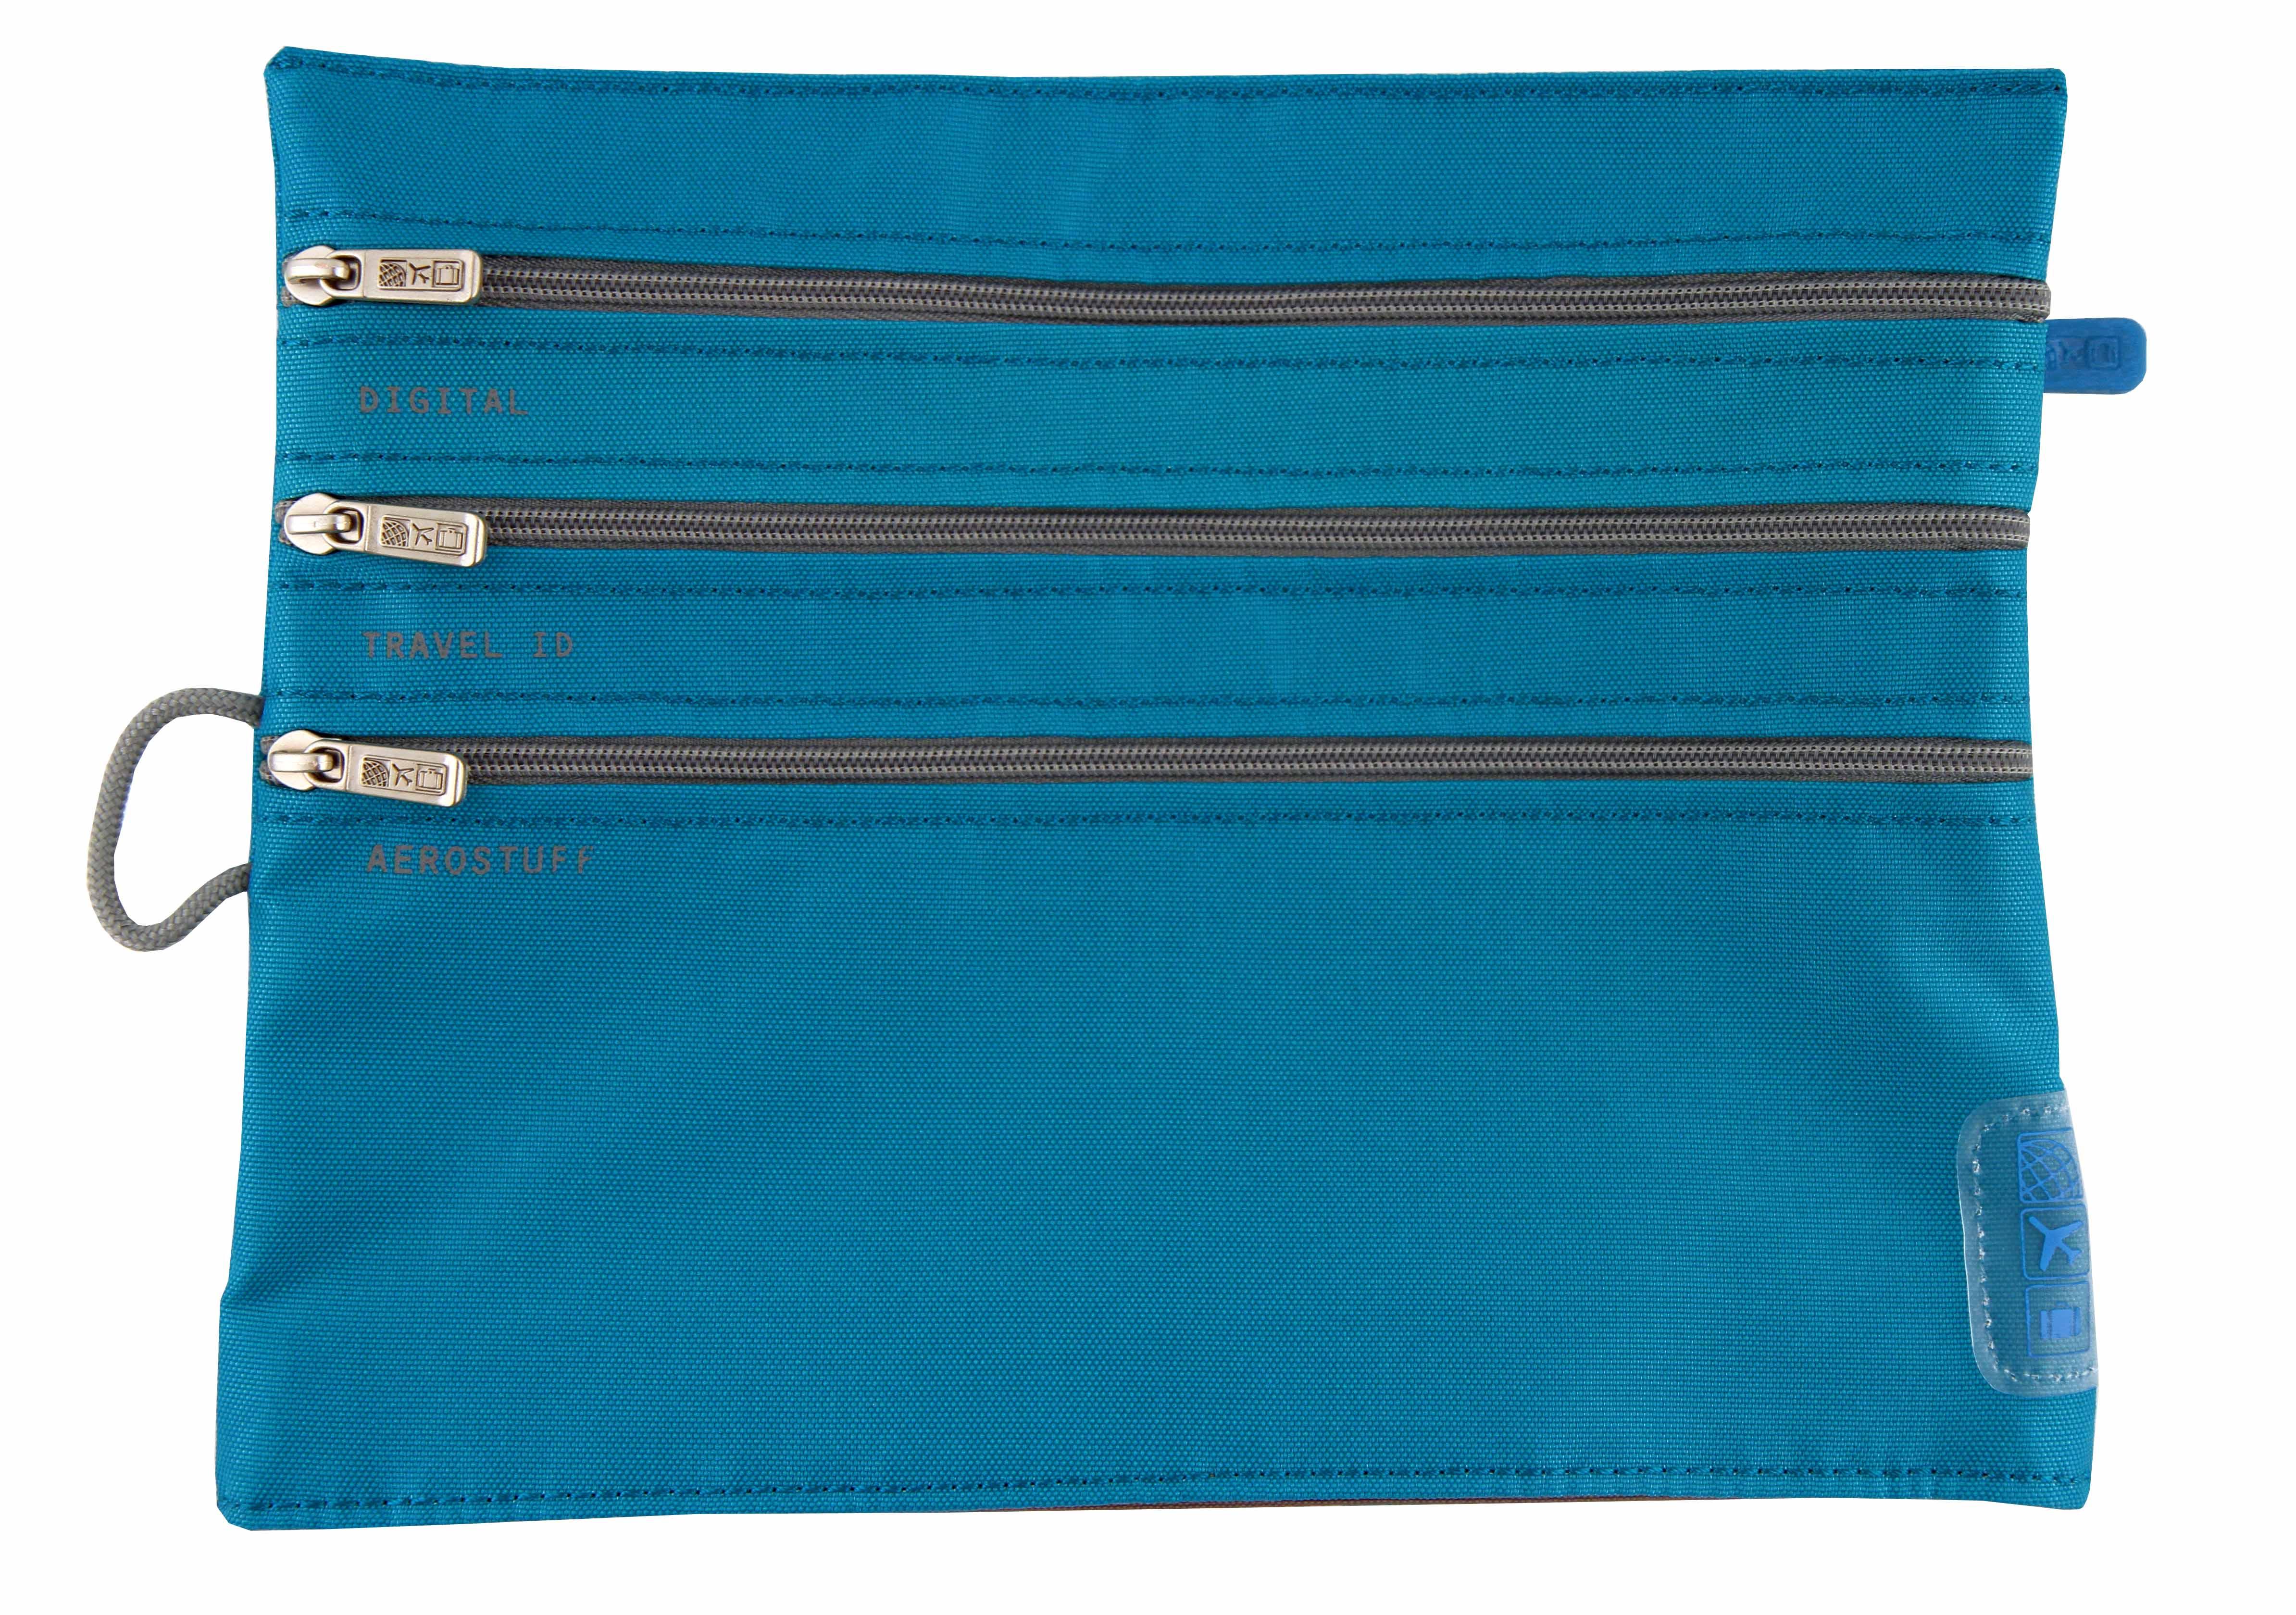 F1 Seat pack - Blue